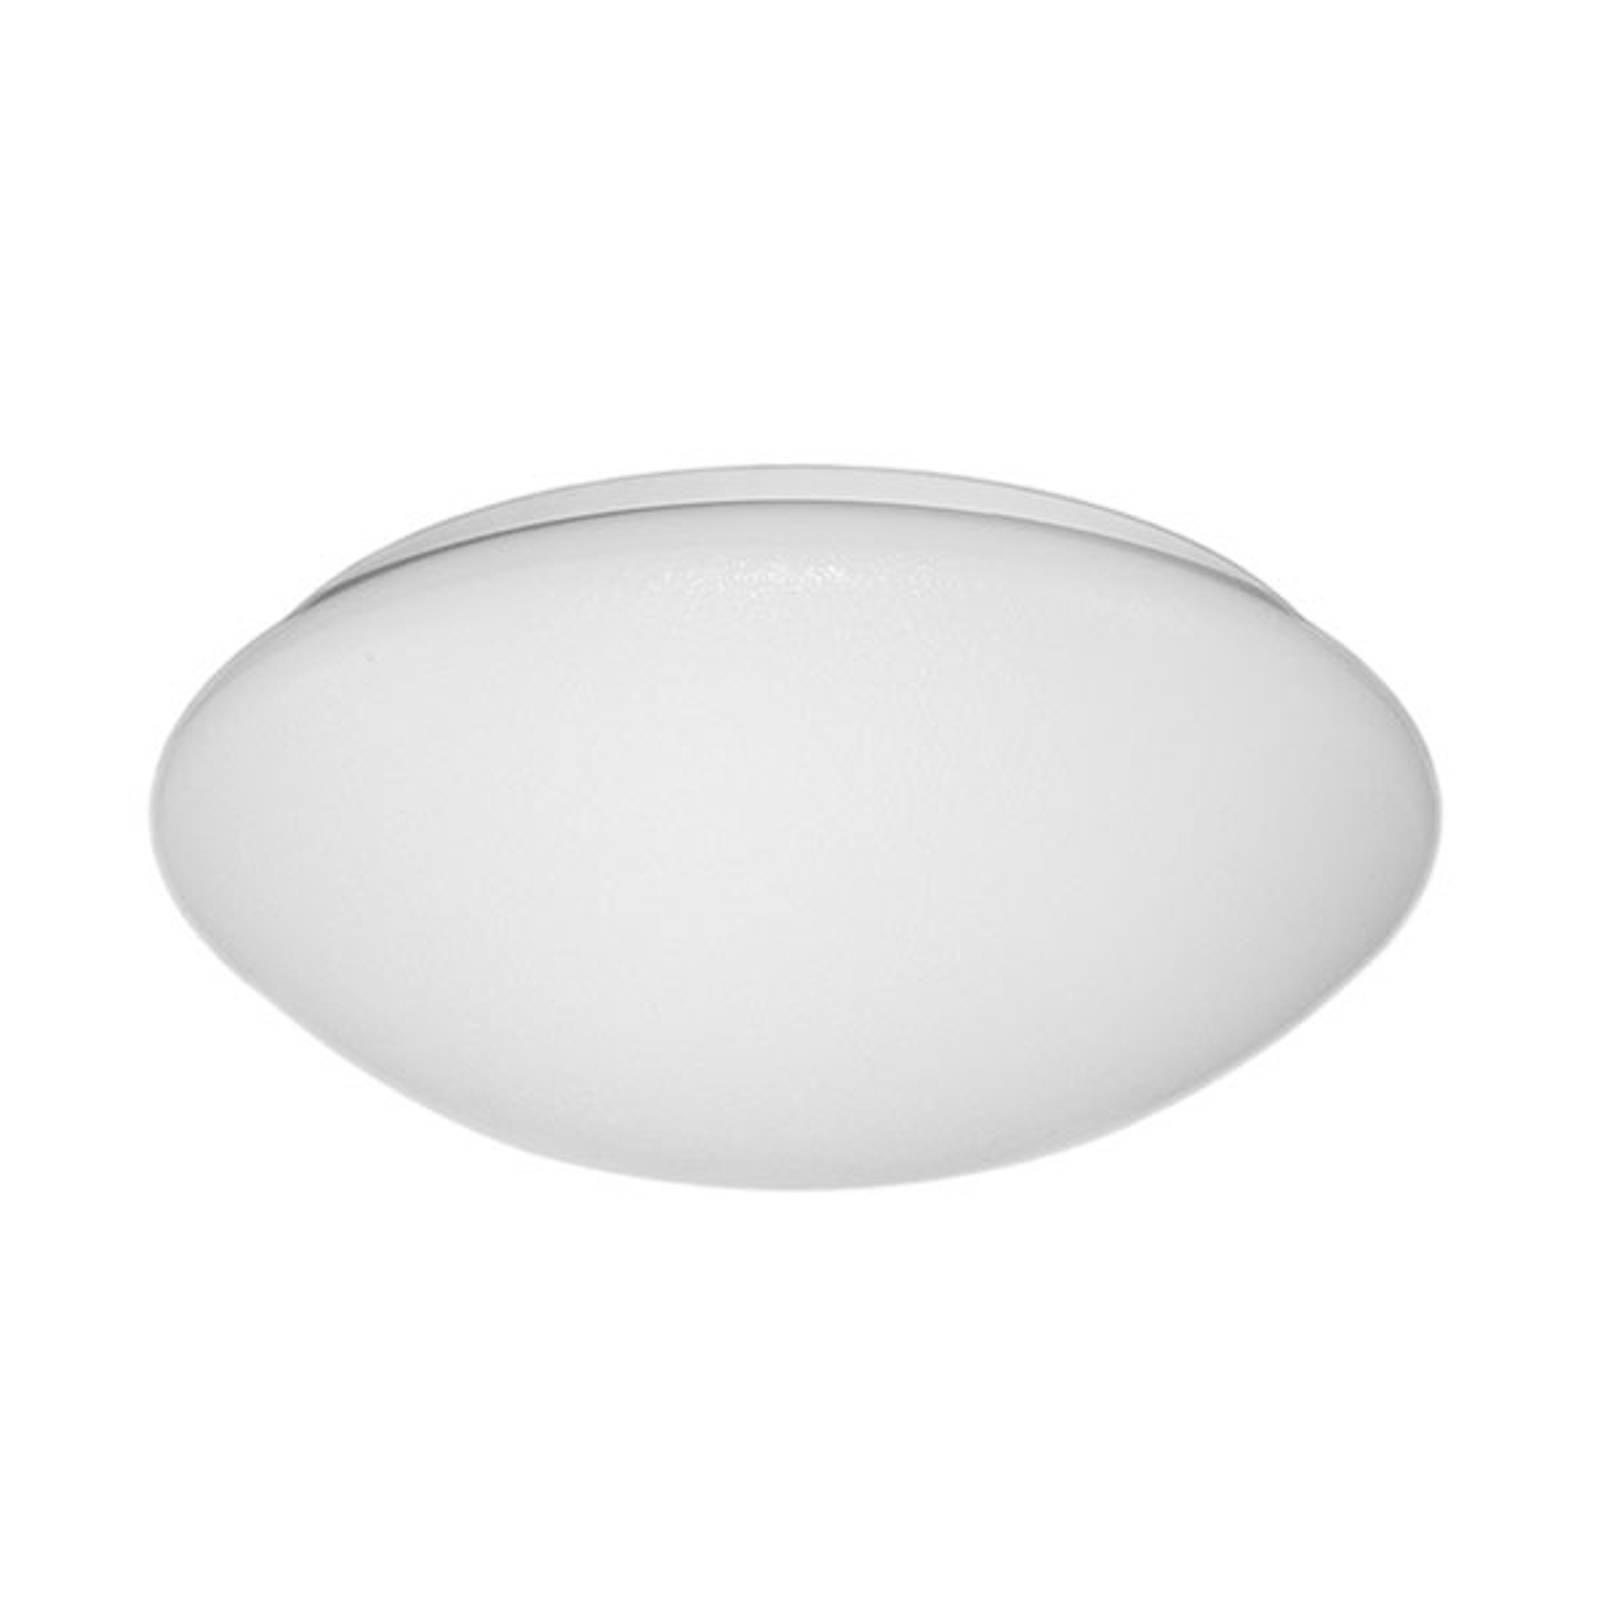 LED-kattovalaisin 27 W, 3 000 K